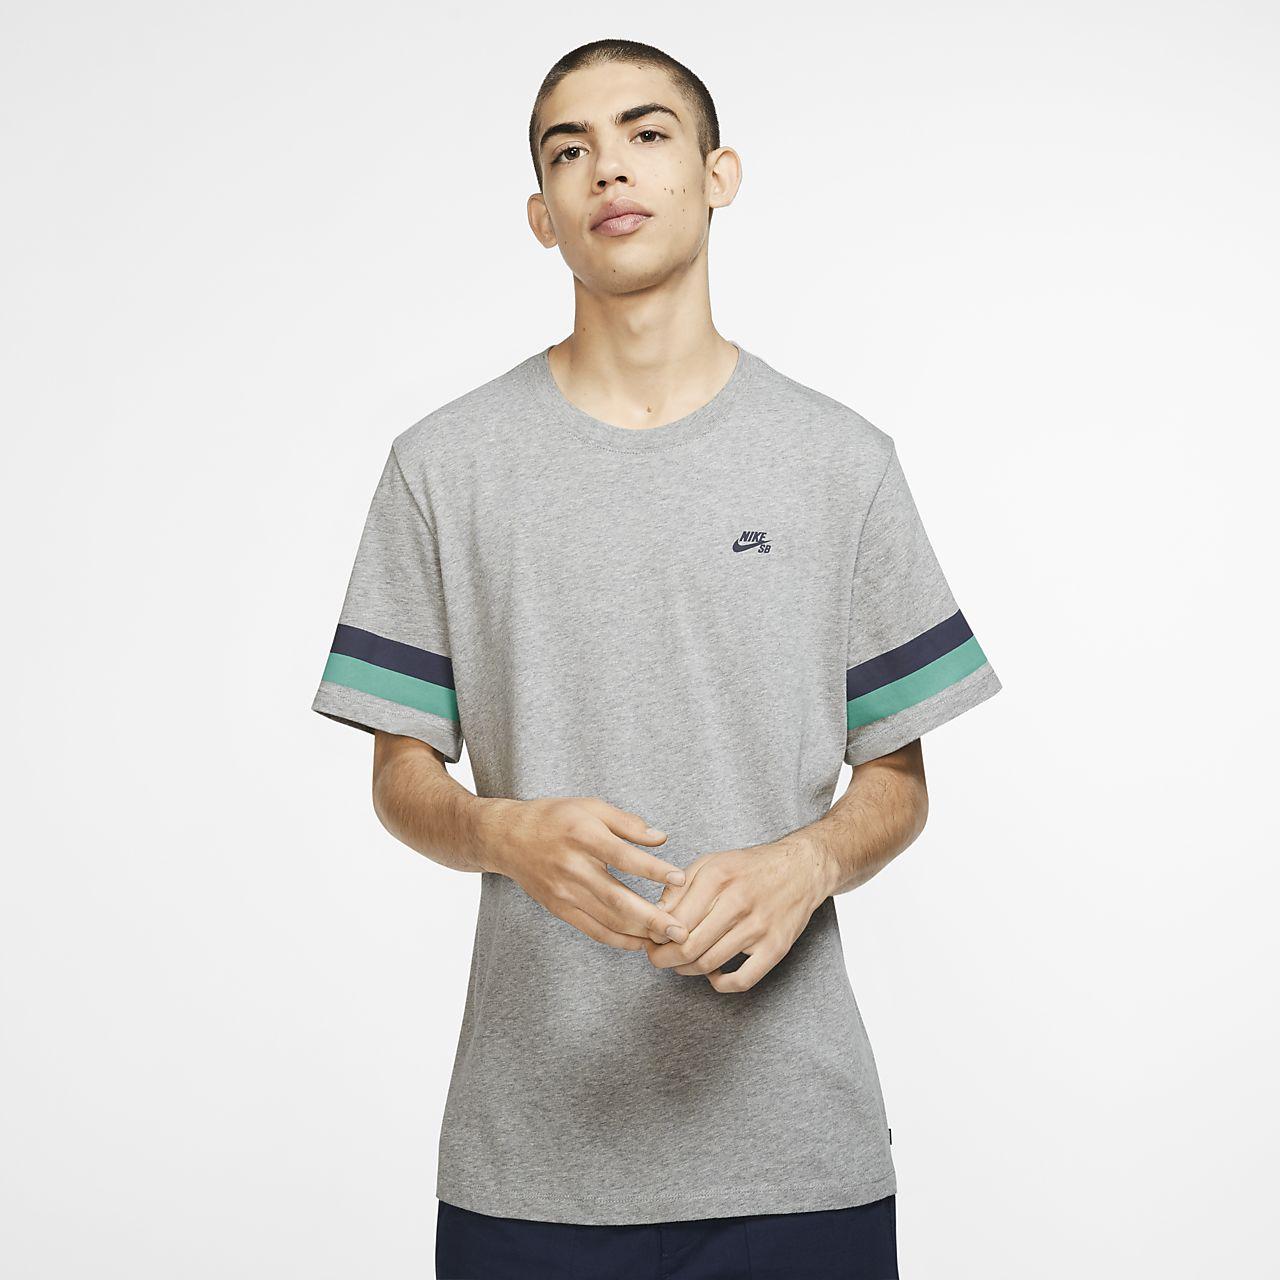 accf0191db3 Nike SB Men s Striped Skate T-Shirt. Nike.com AT